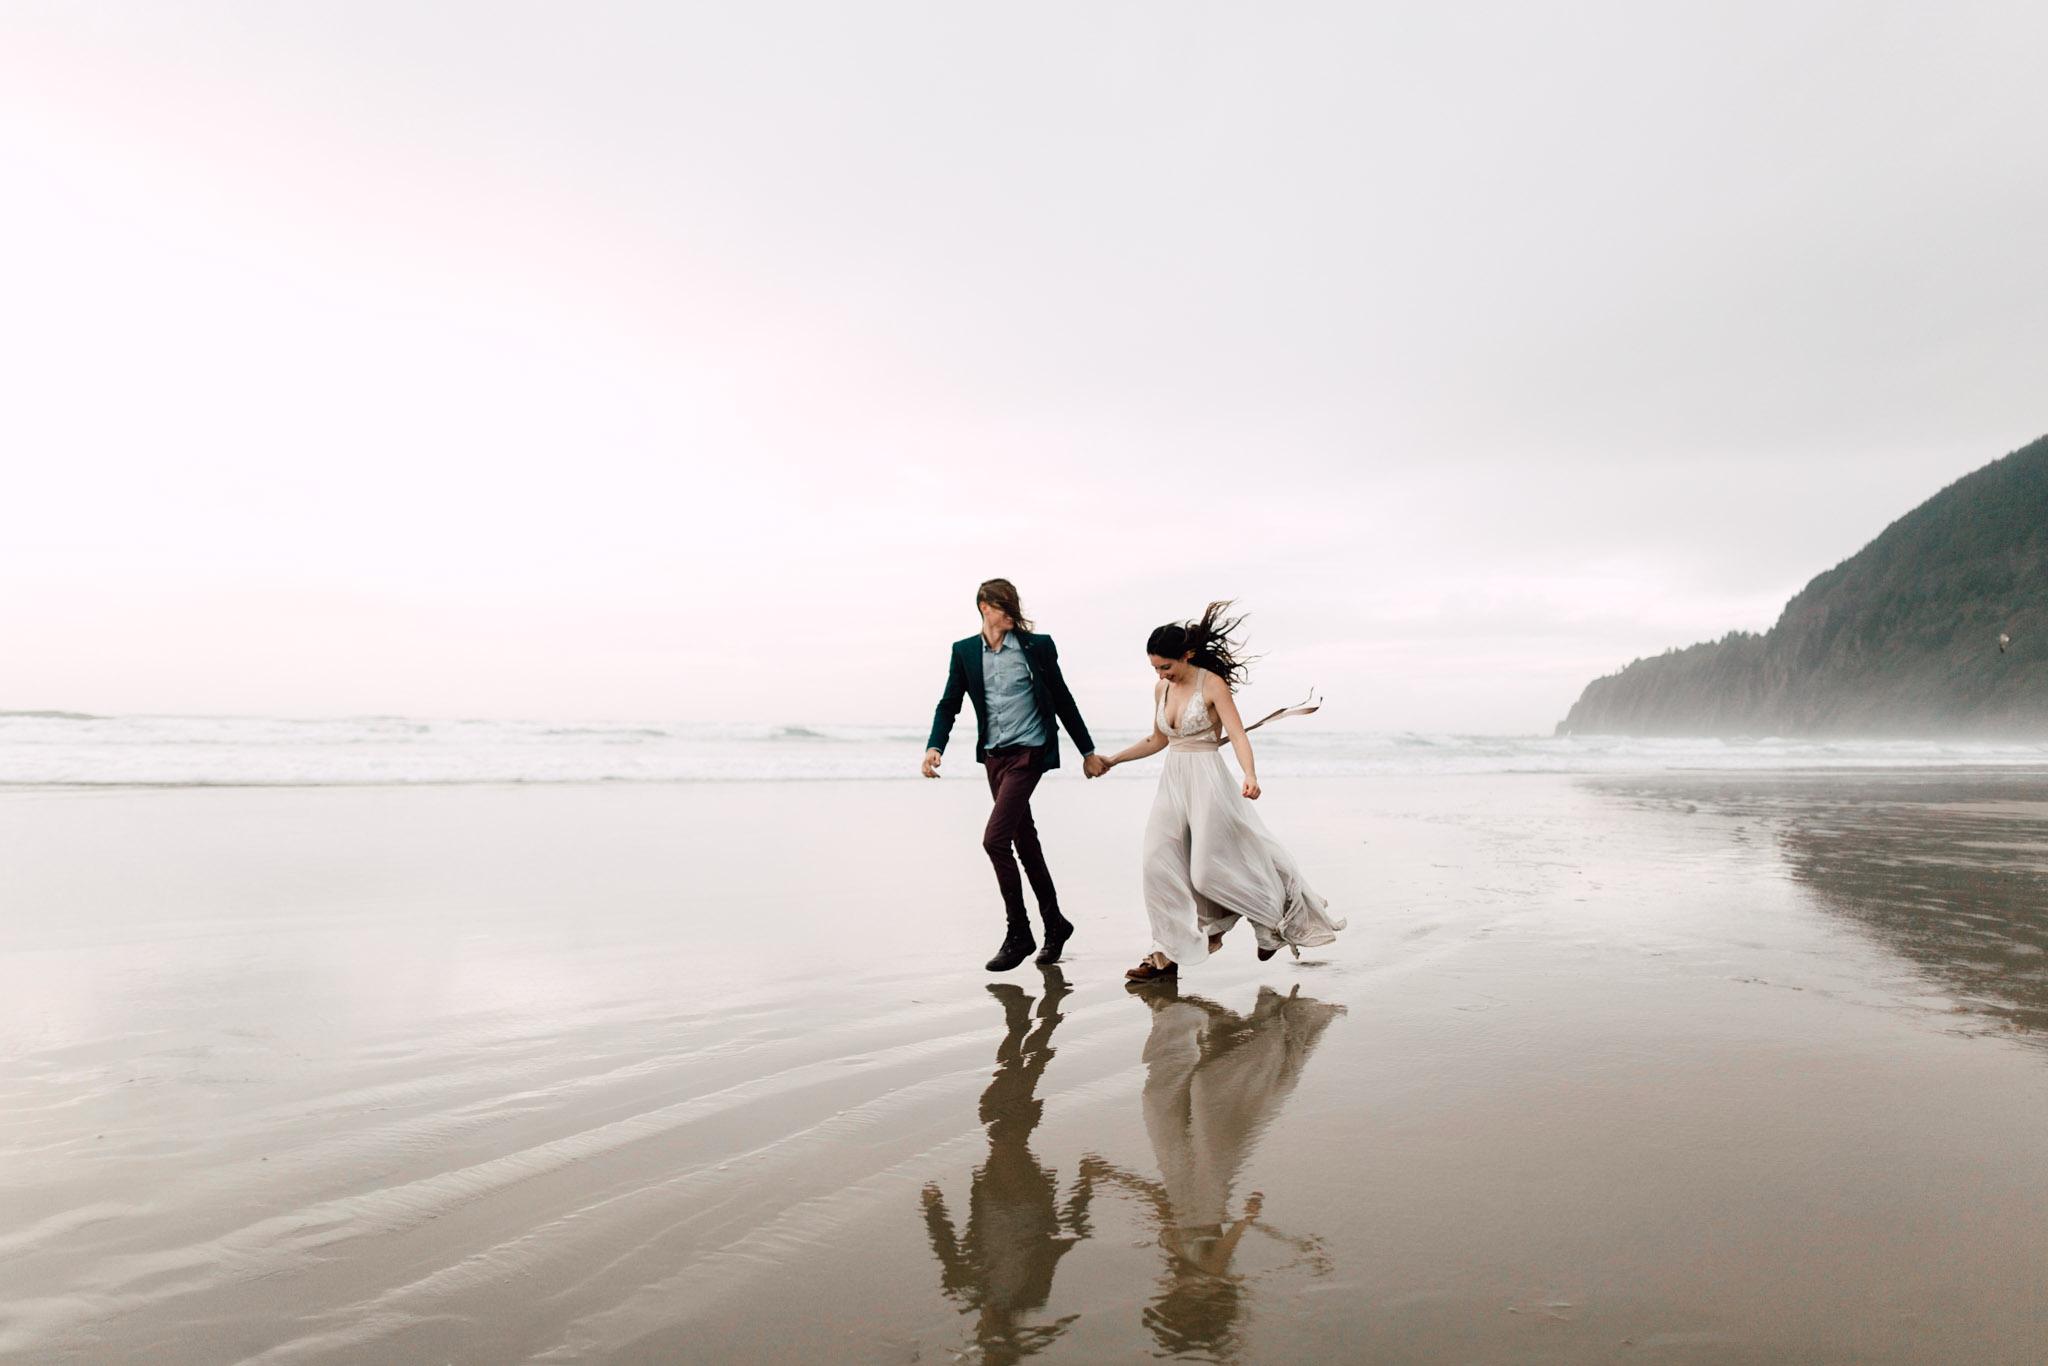 Oregon-Coast-Manzanita-Beach-Engagement-Pia-Anna-Christian-Wedding-Photography-PNW-GB-26.jpg